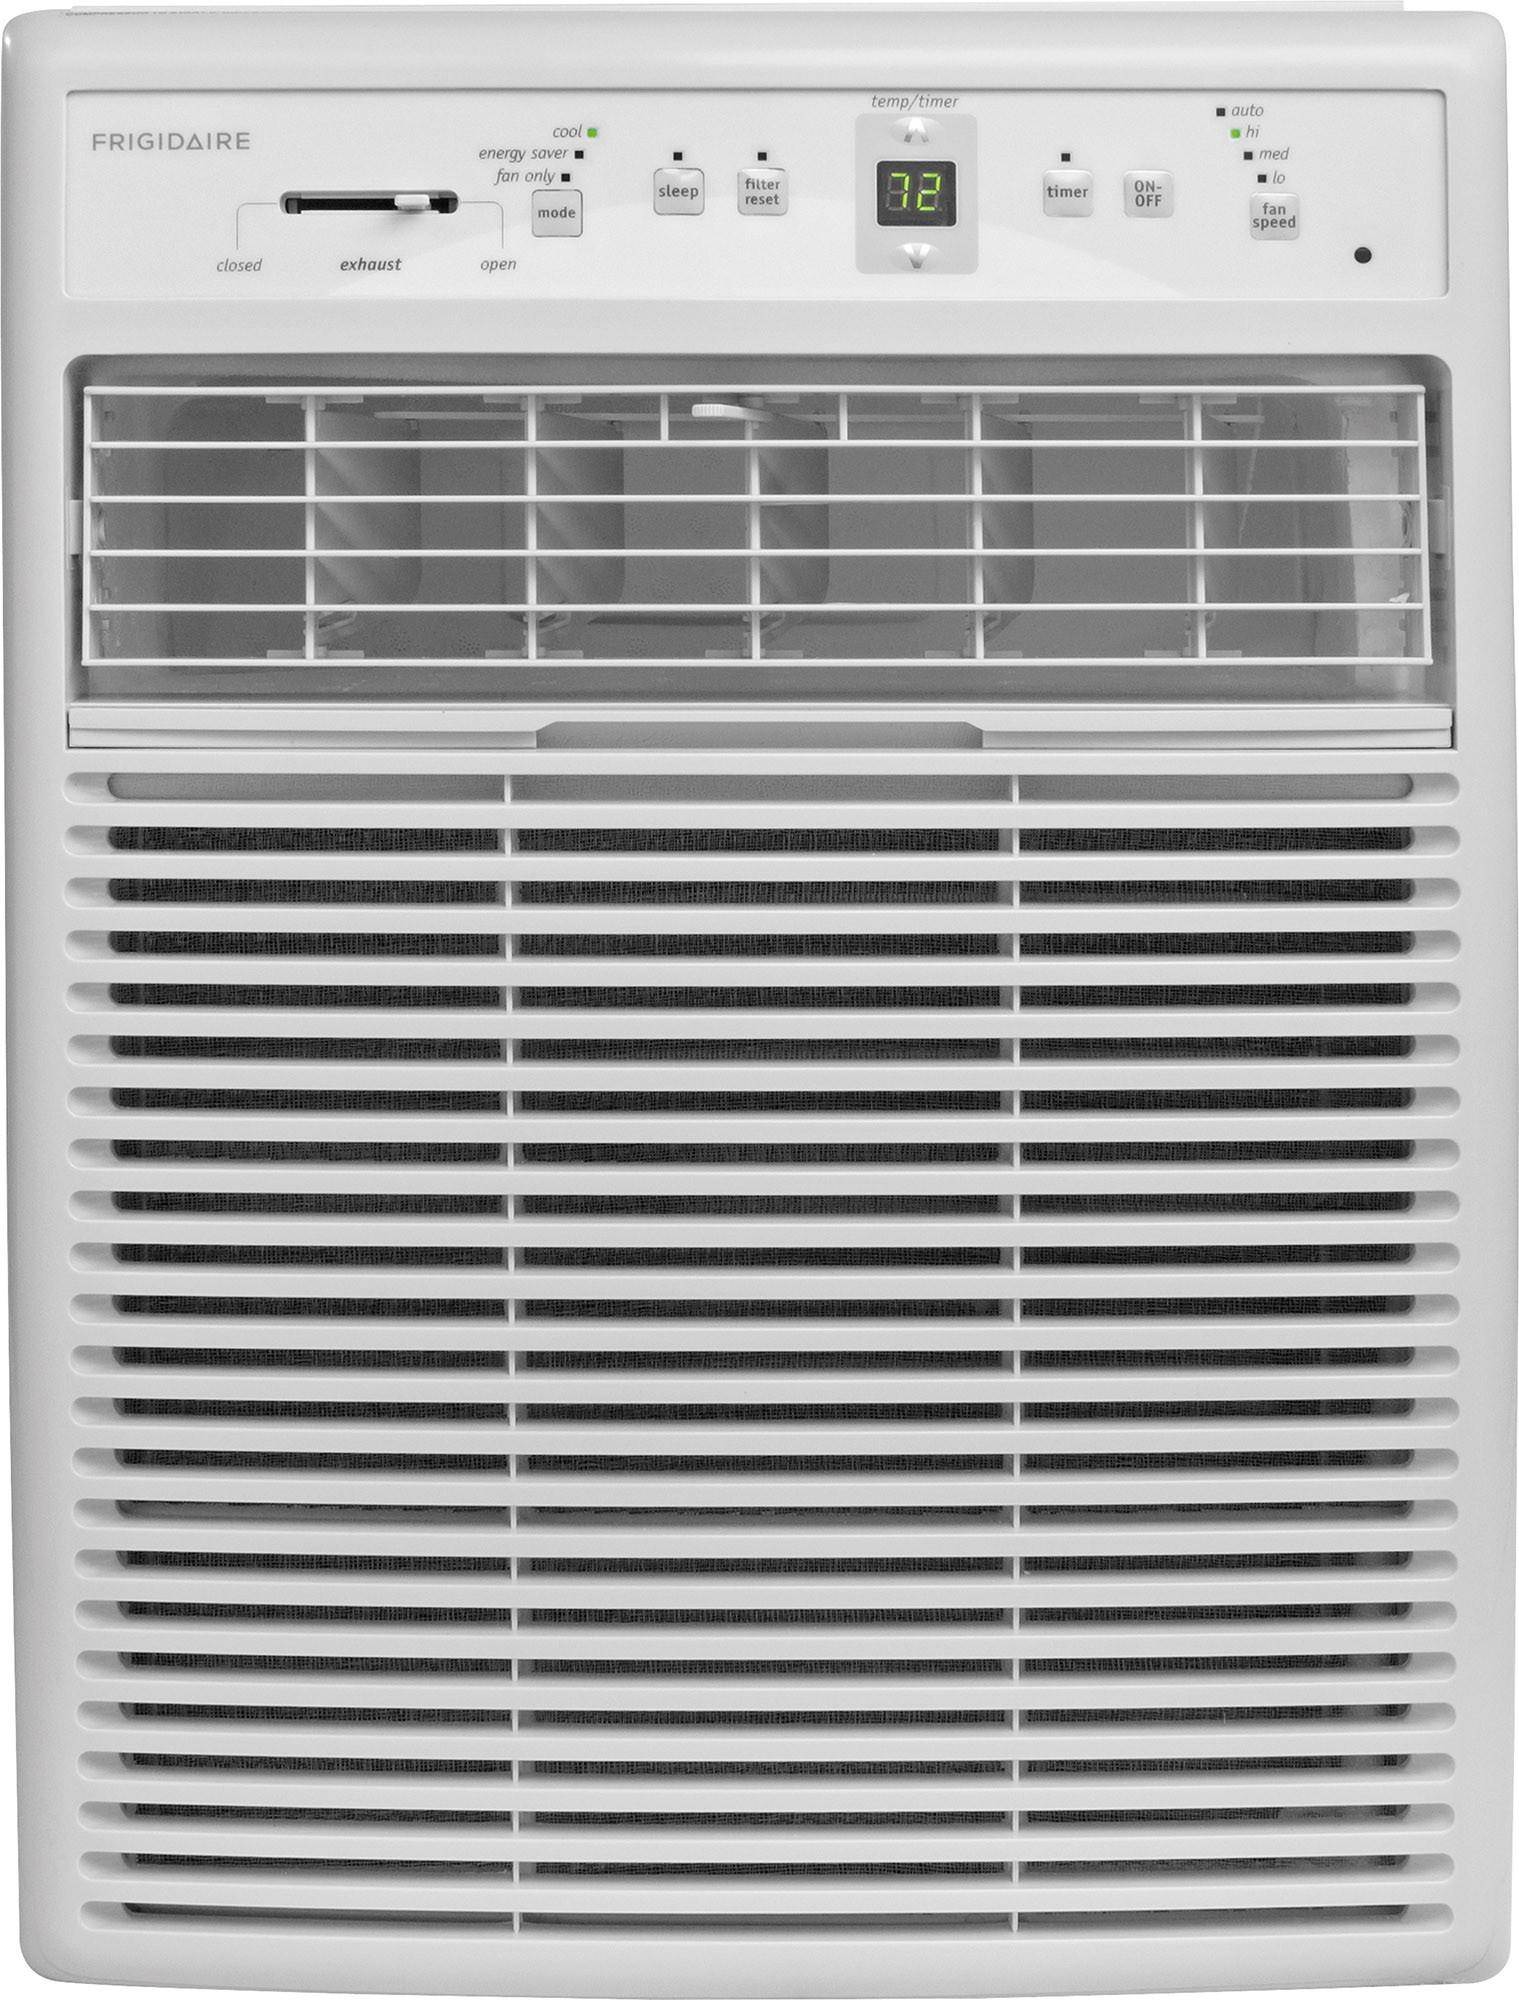 Frigidaire Ffrs0822s1 8 000 Btu Room Air Conditioner With 263 Cfm 3 Fan Speeds Effortless Temperature Control 24 Hour Timer Energy Saver Mode Effortless Re Window Air Conditioner Casement Window Air Conditioner Casement Air Conditioner